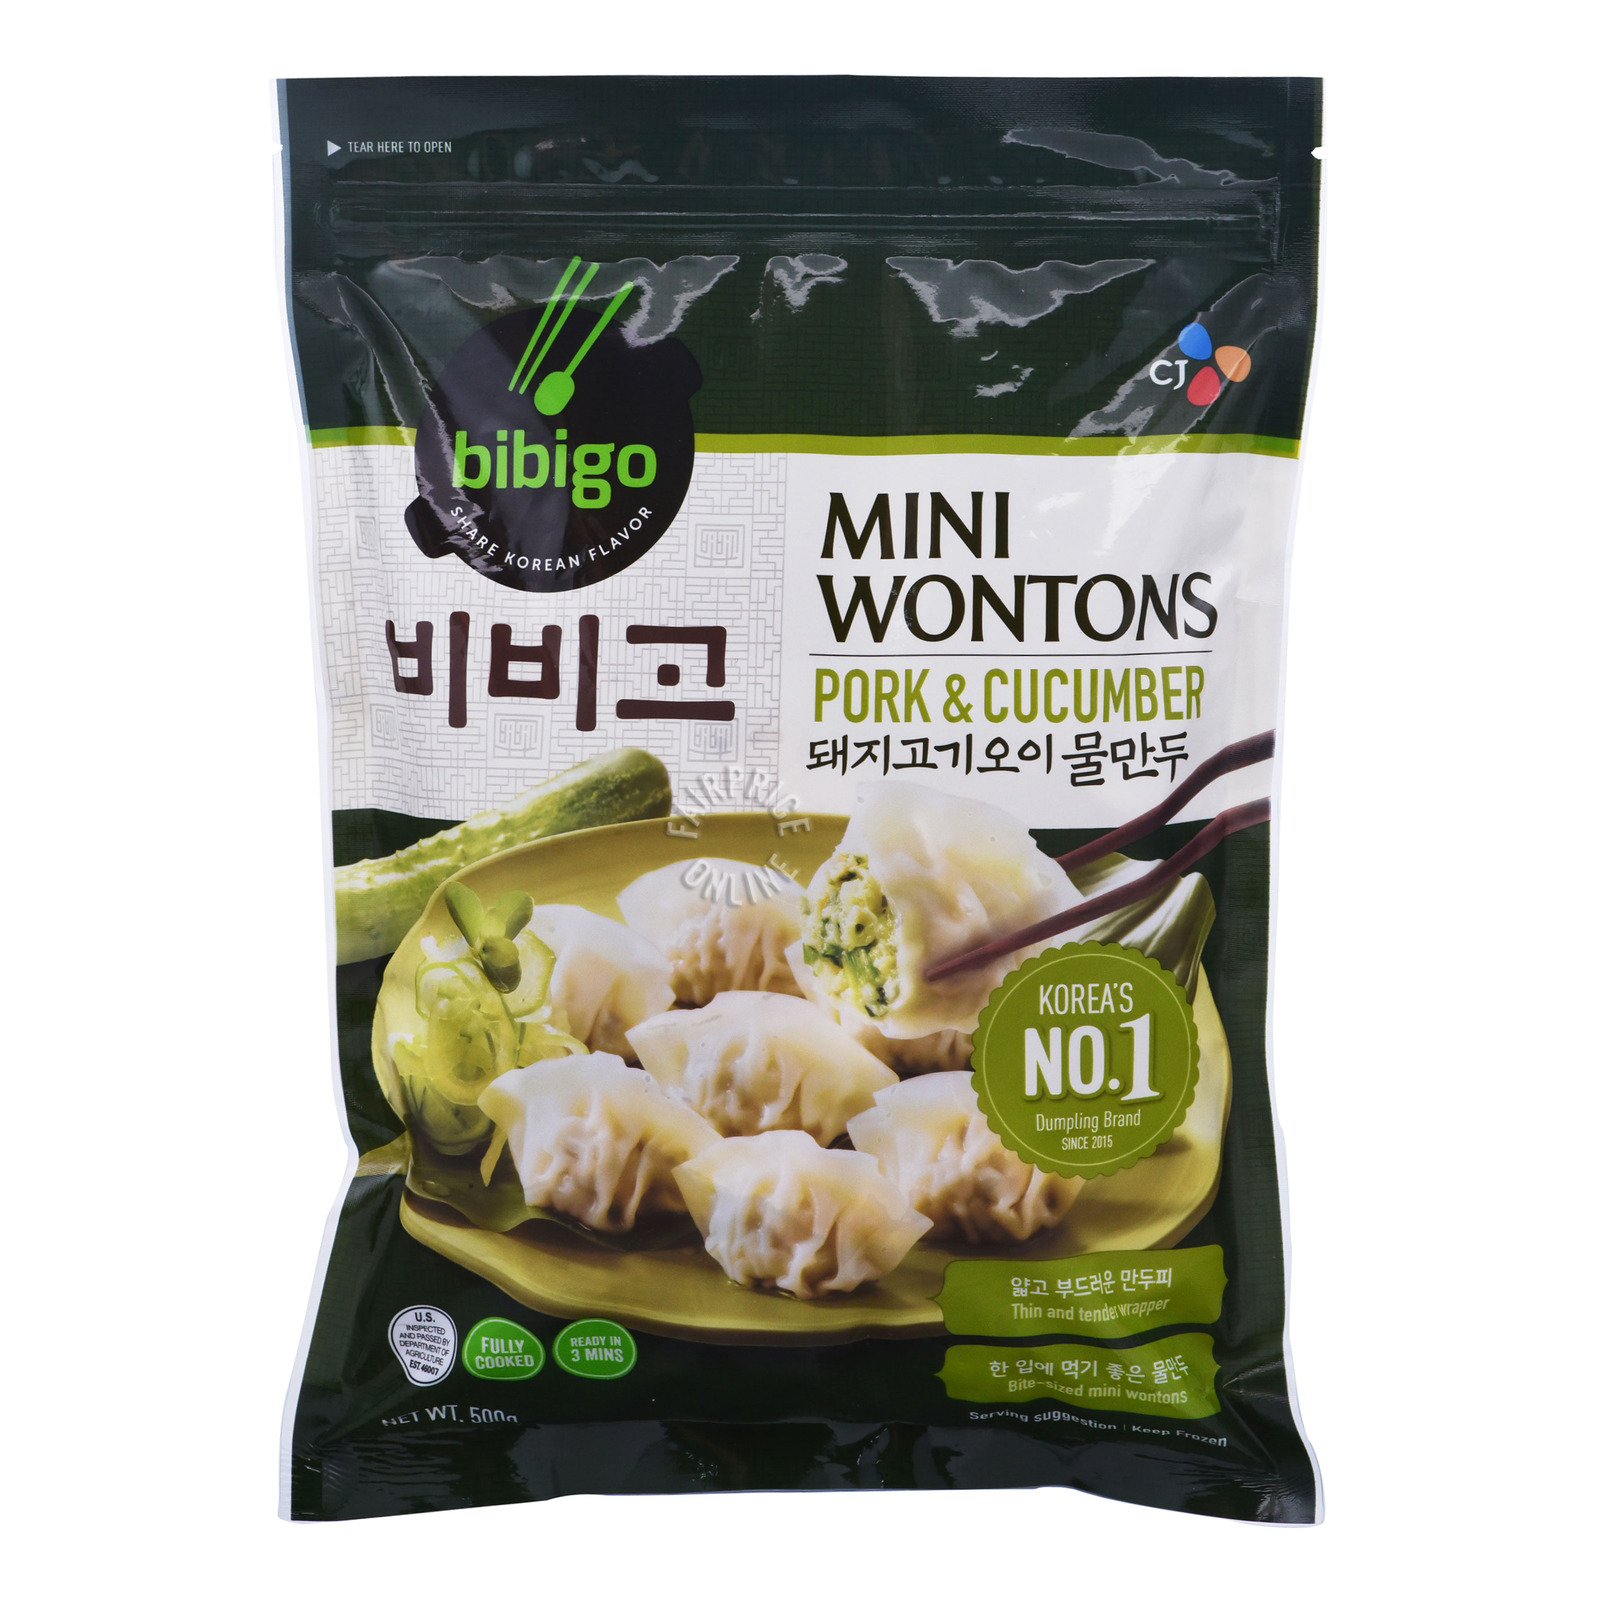 CJ Bibigo Frozen Wontons - Pork & Cucumber